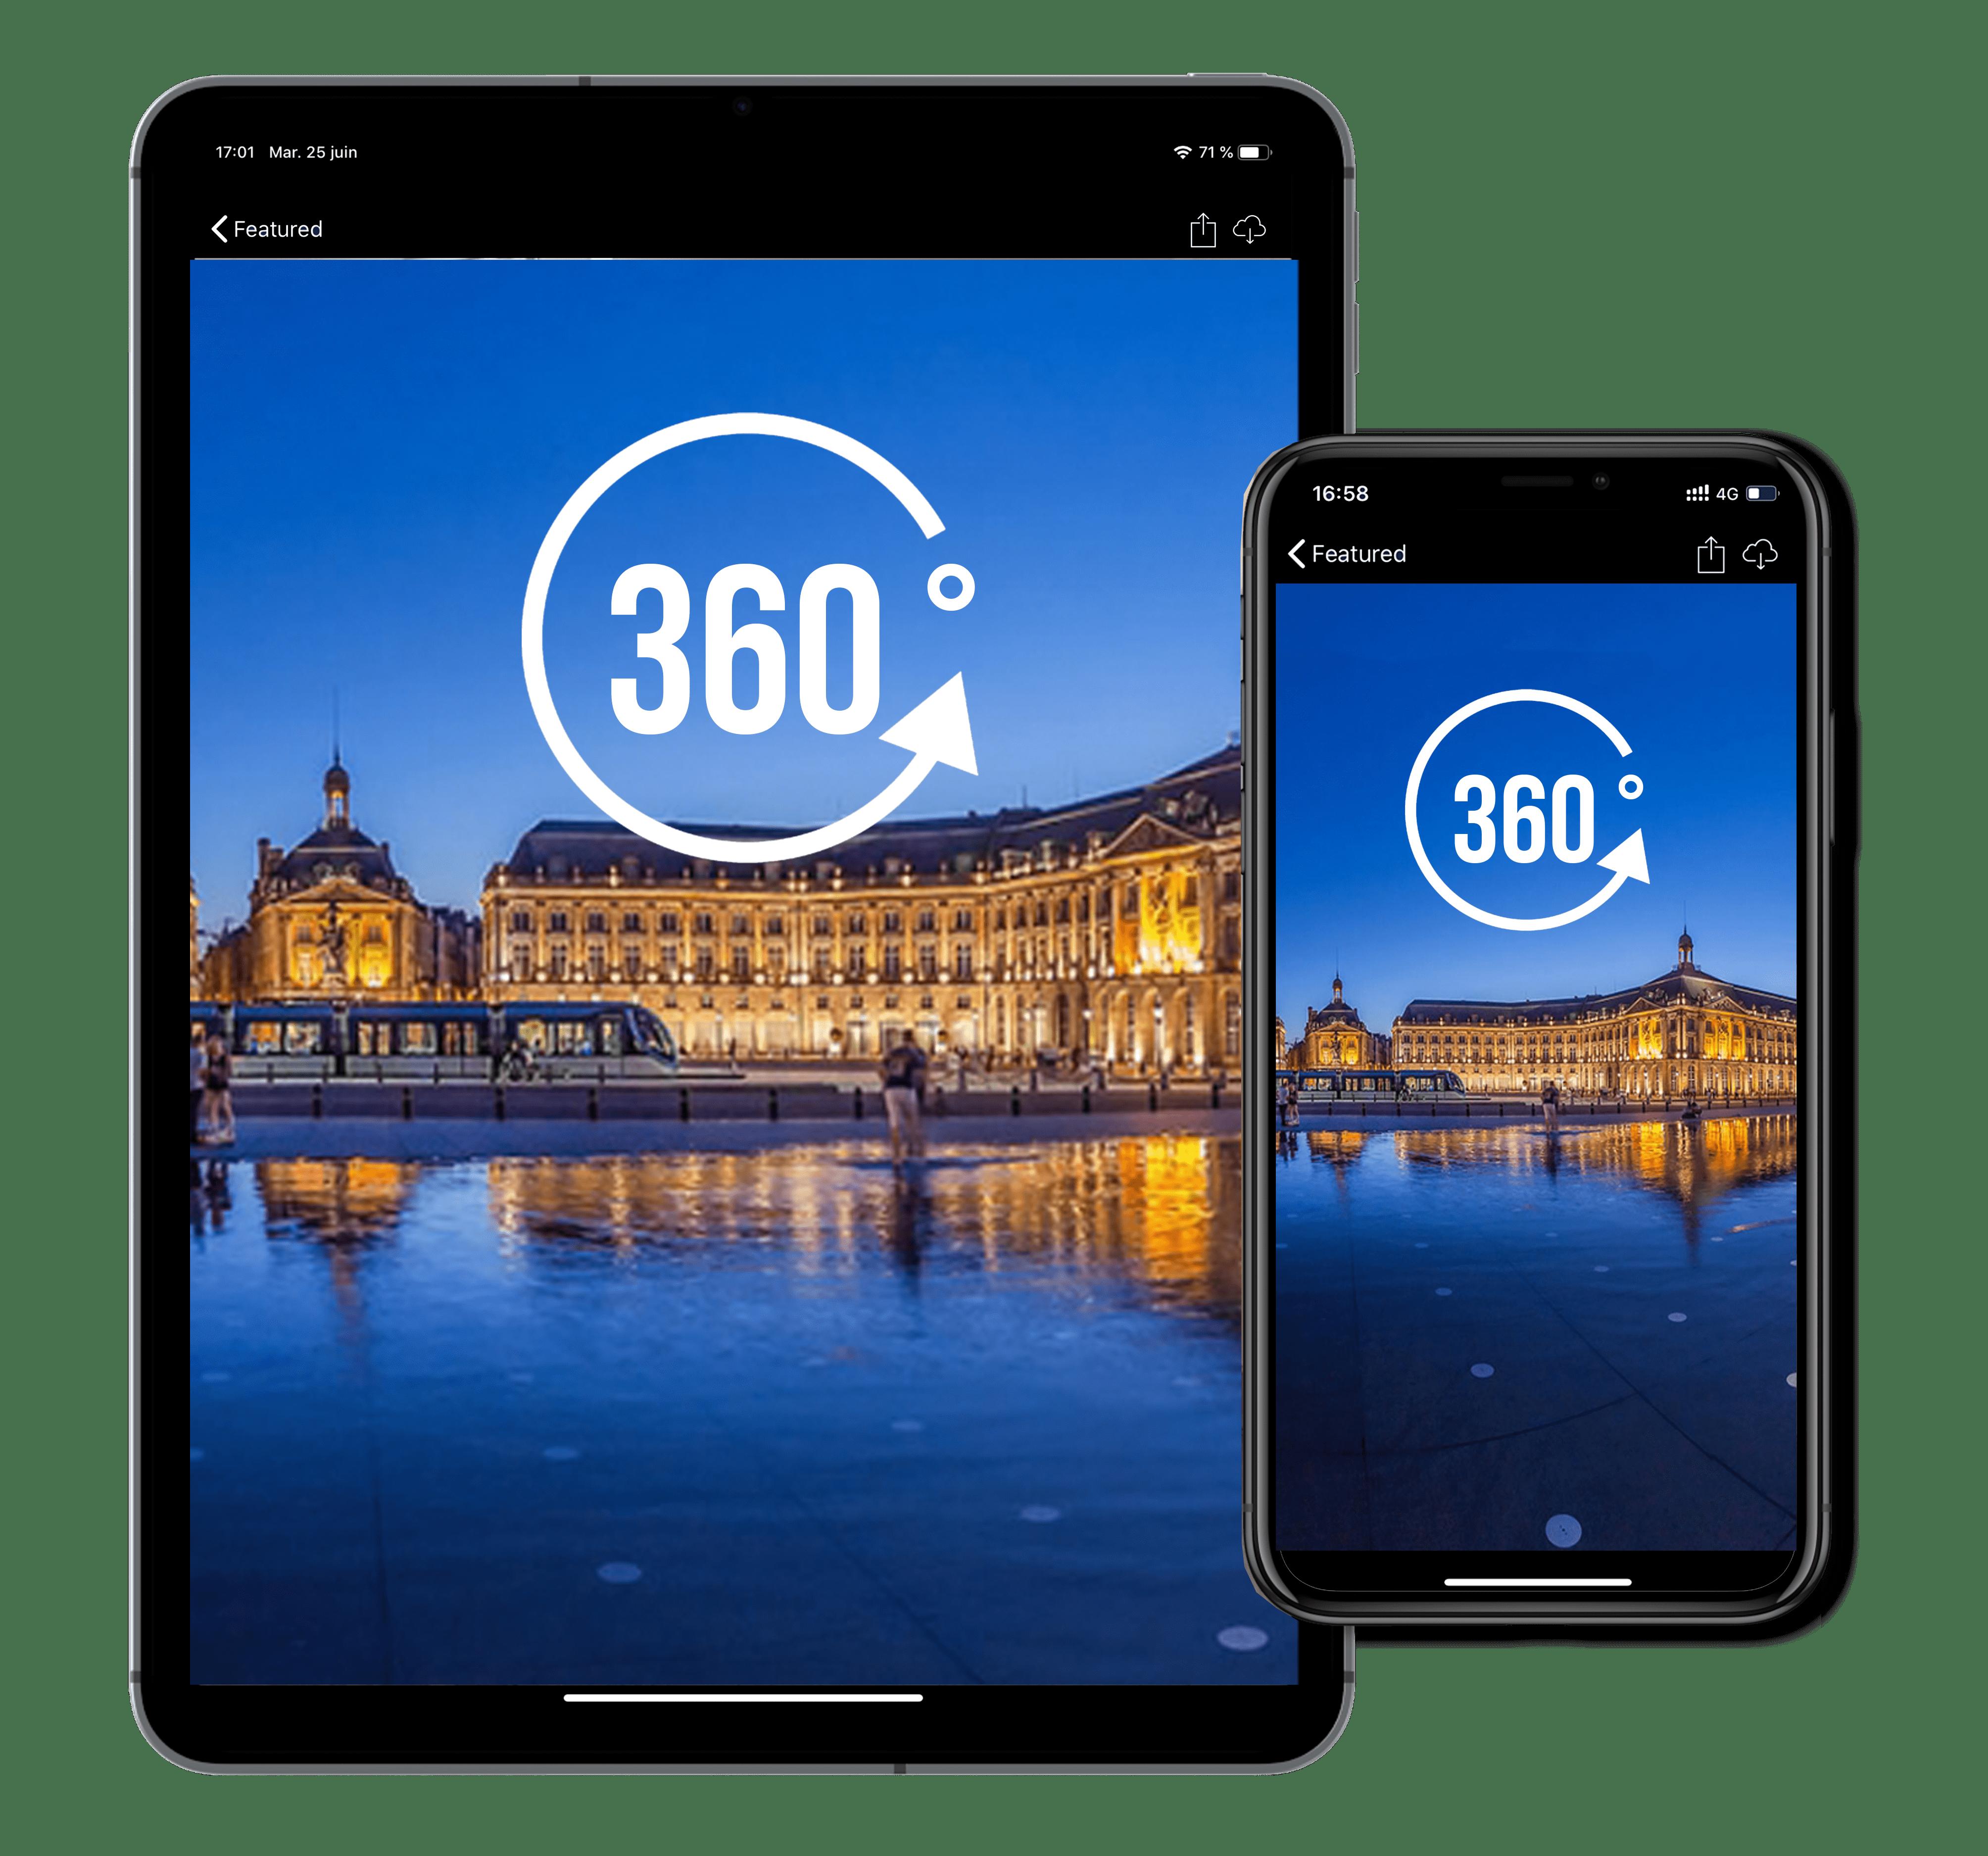 Ipad-Iphone-vidéo-360-min